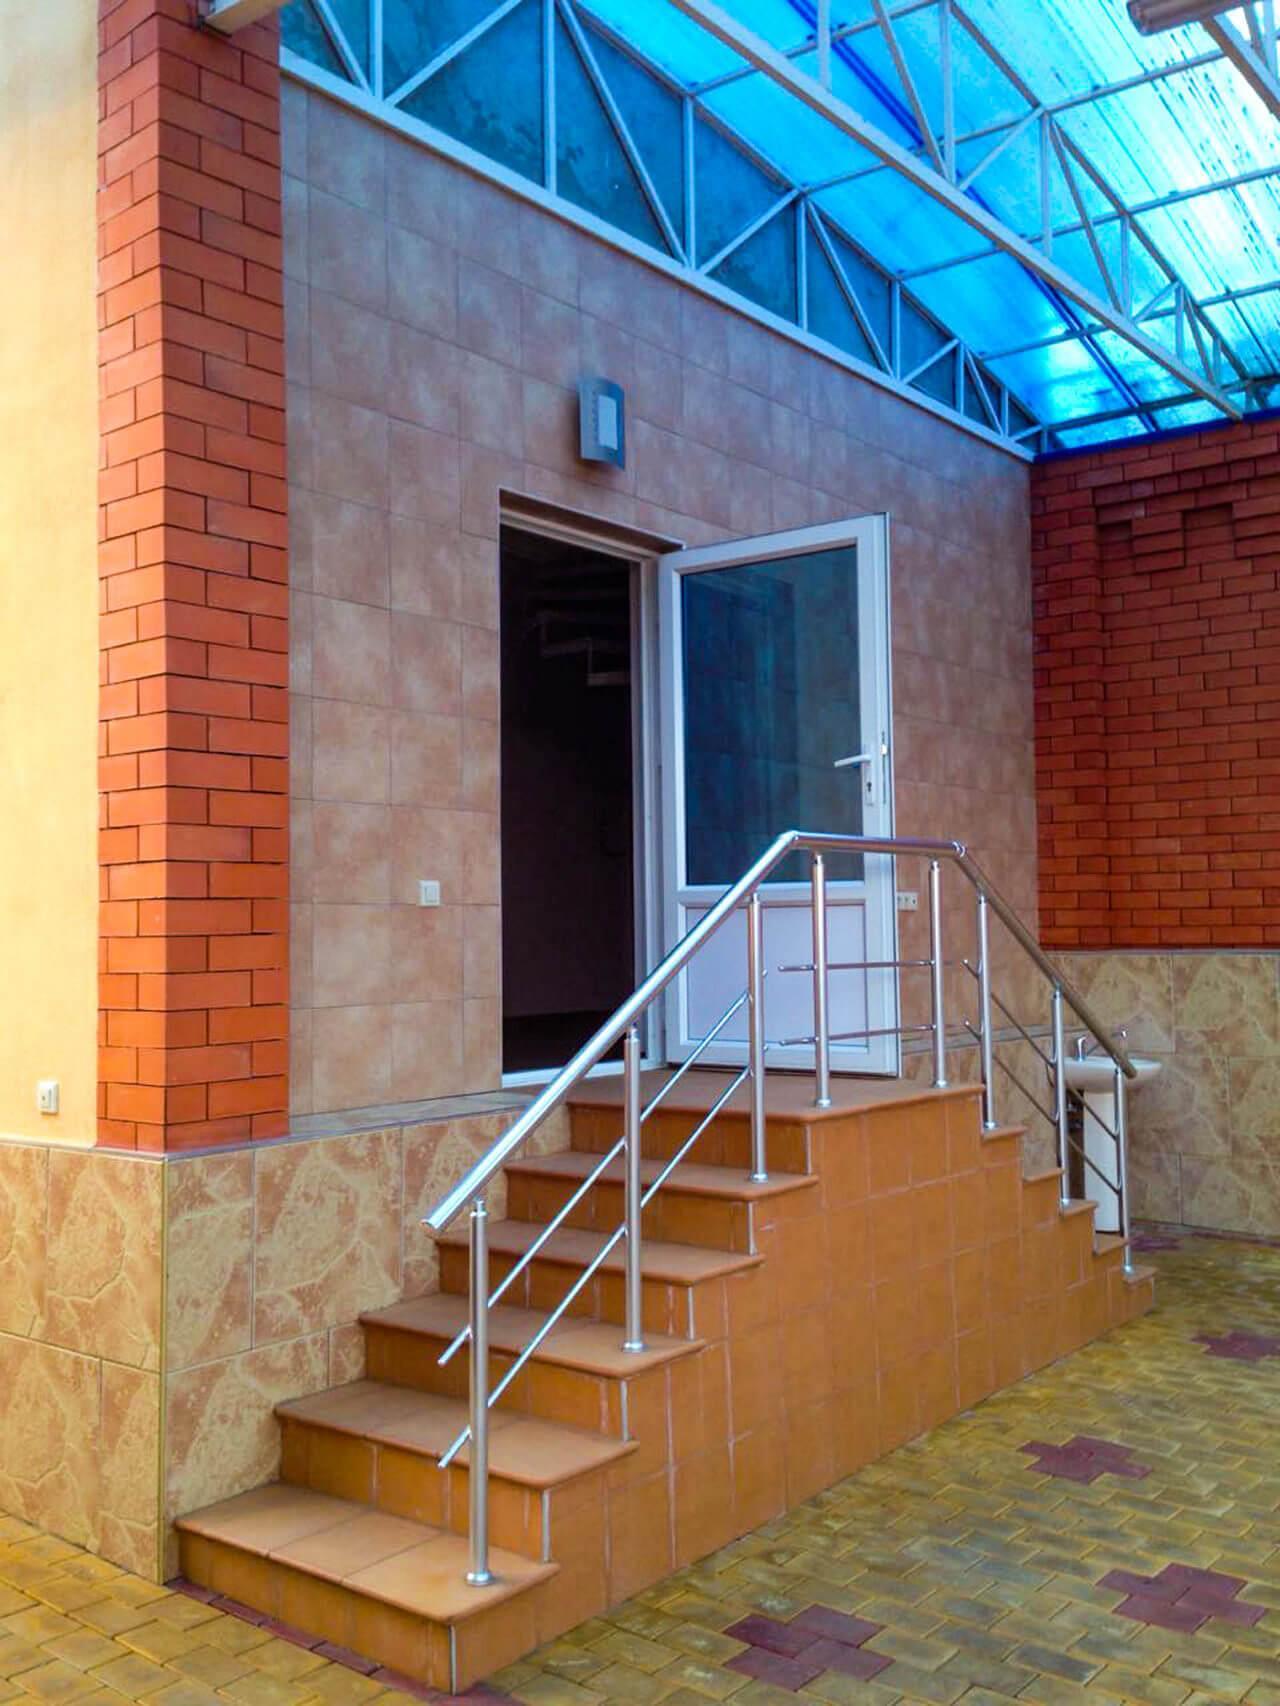 Гостевой дом по улице Дачная - image Gostevoj-dom-po-ulitse-Dachnaya-13 on http://bizneskvartal.ru